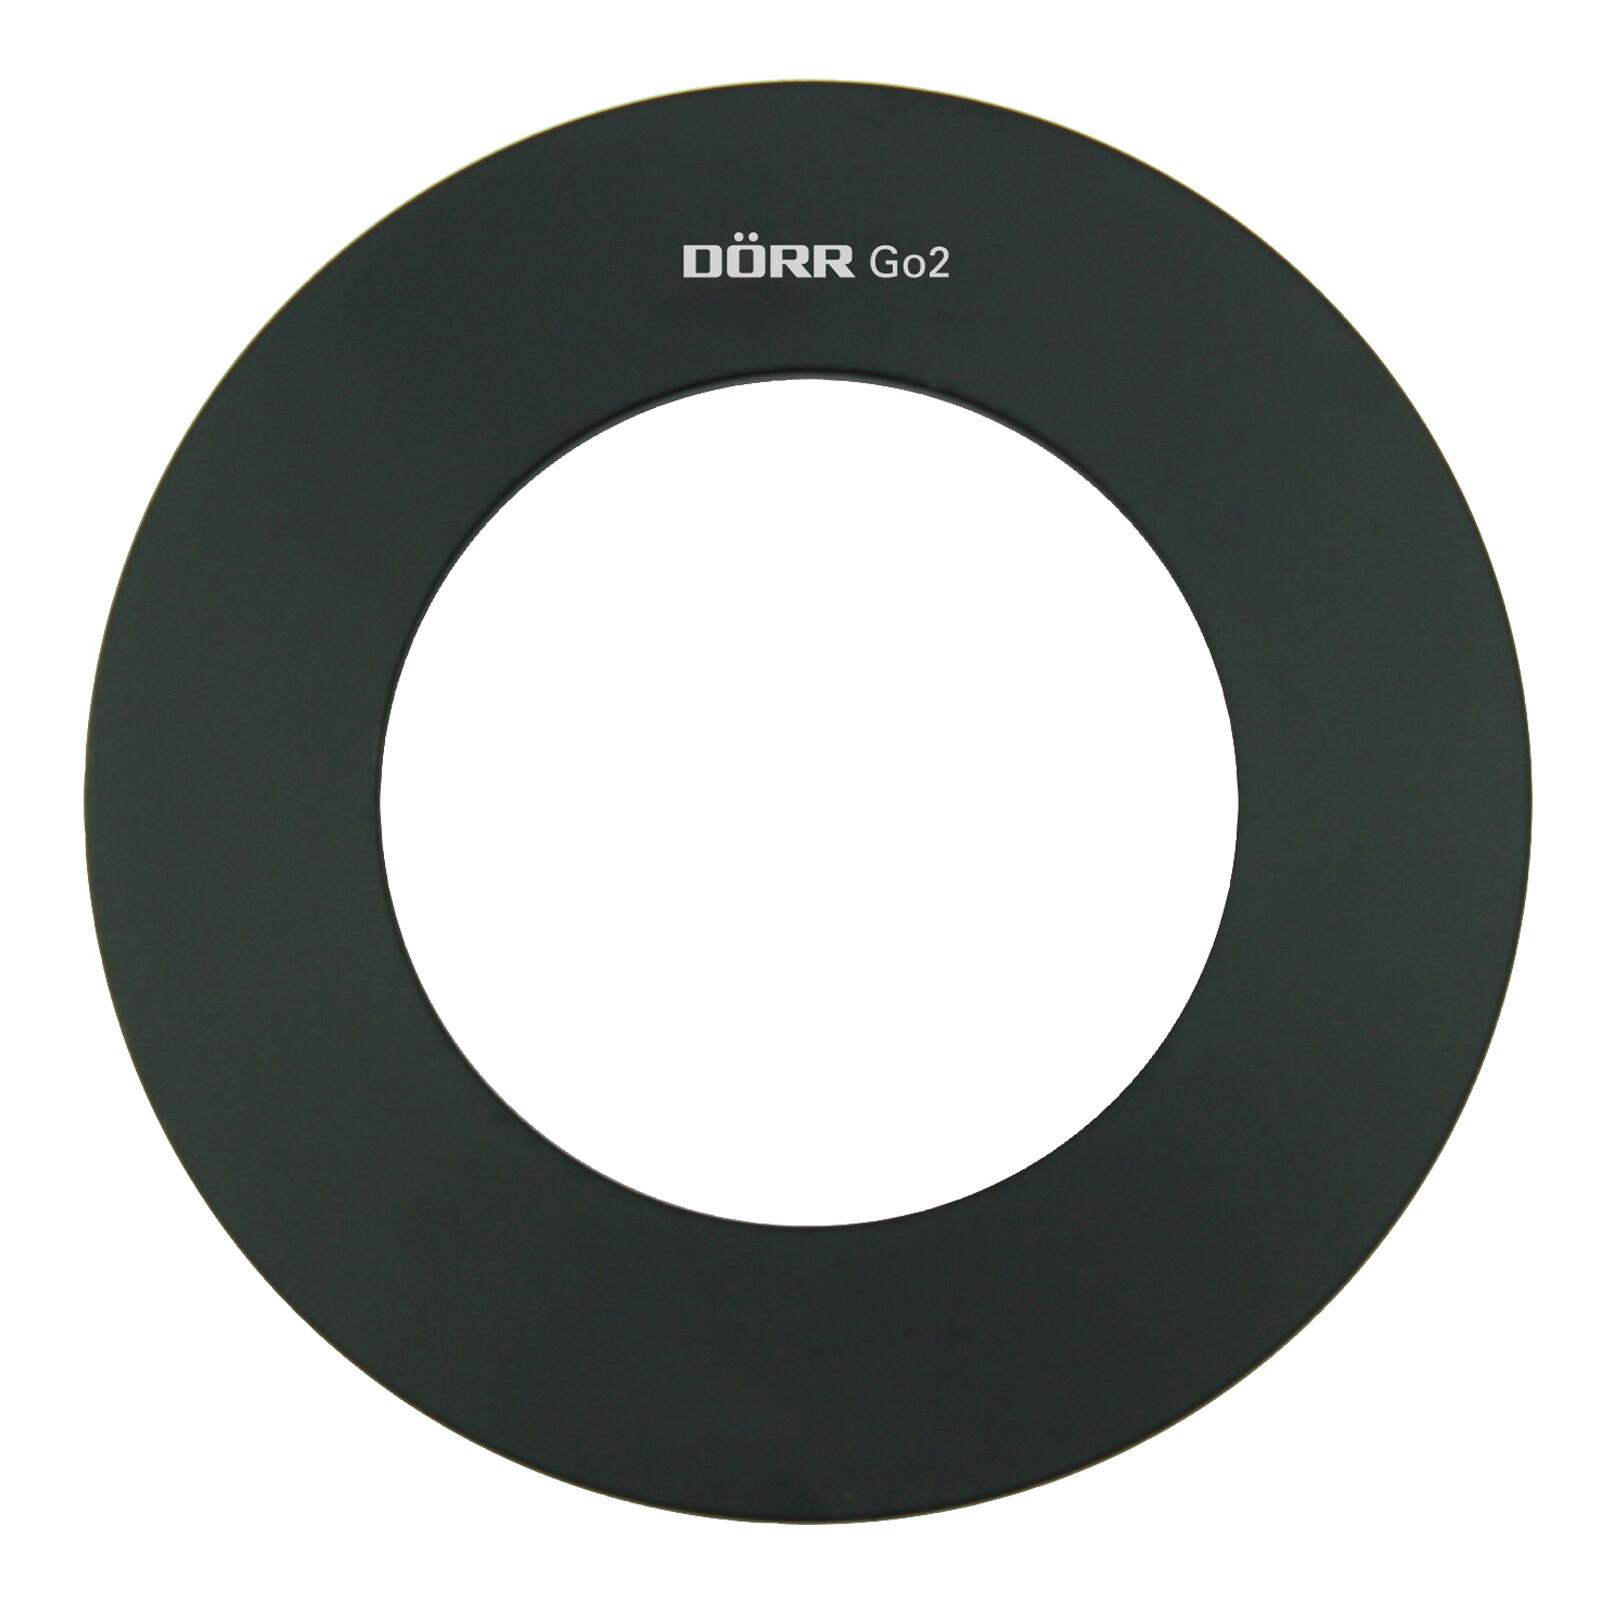 Dörr Go2 Metall Anschlussring 58mm